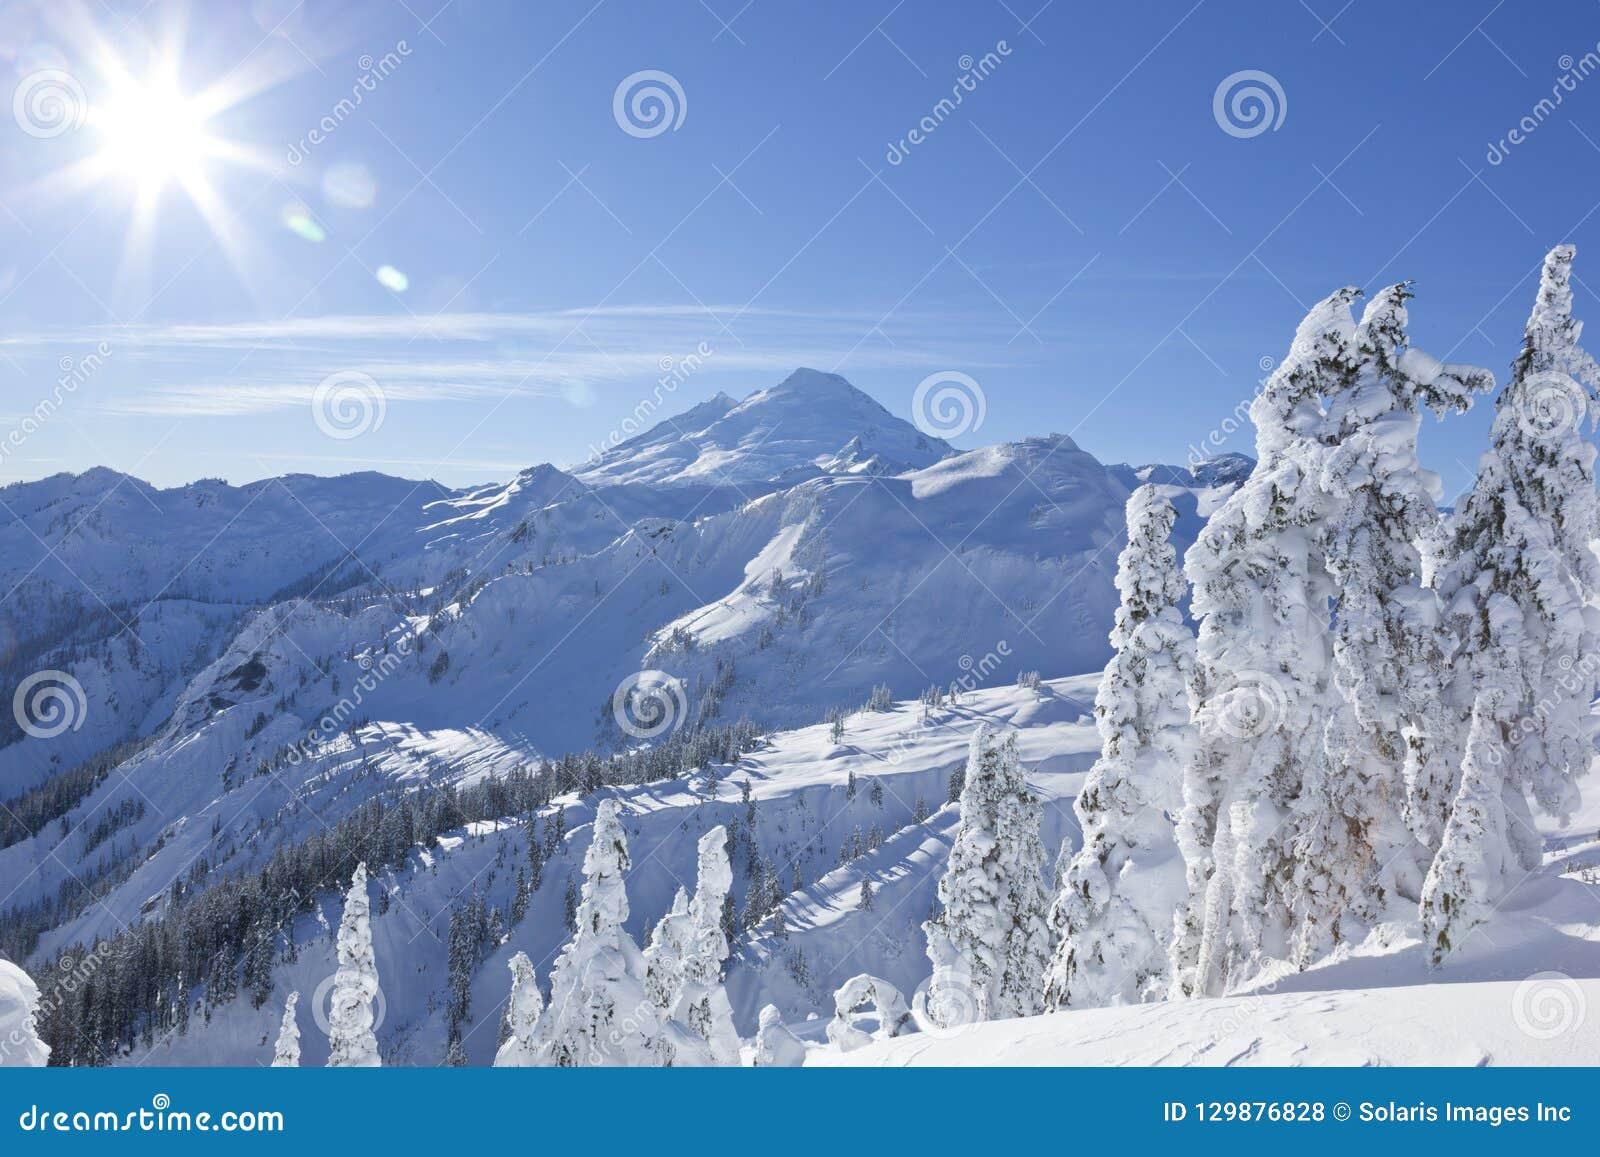 Mount Baker mountain peak summit, North Cascades National Park winter nature scene